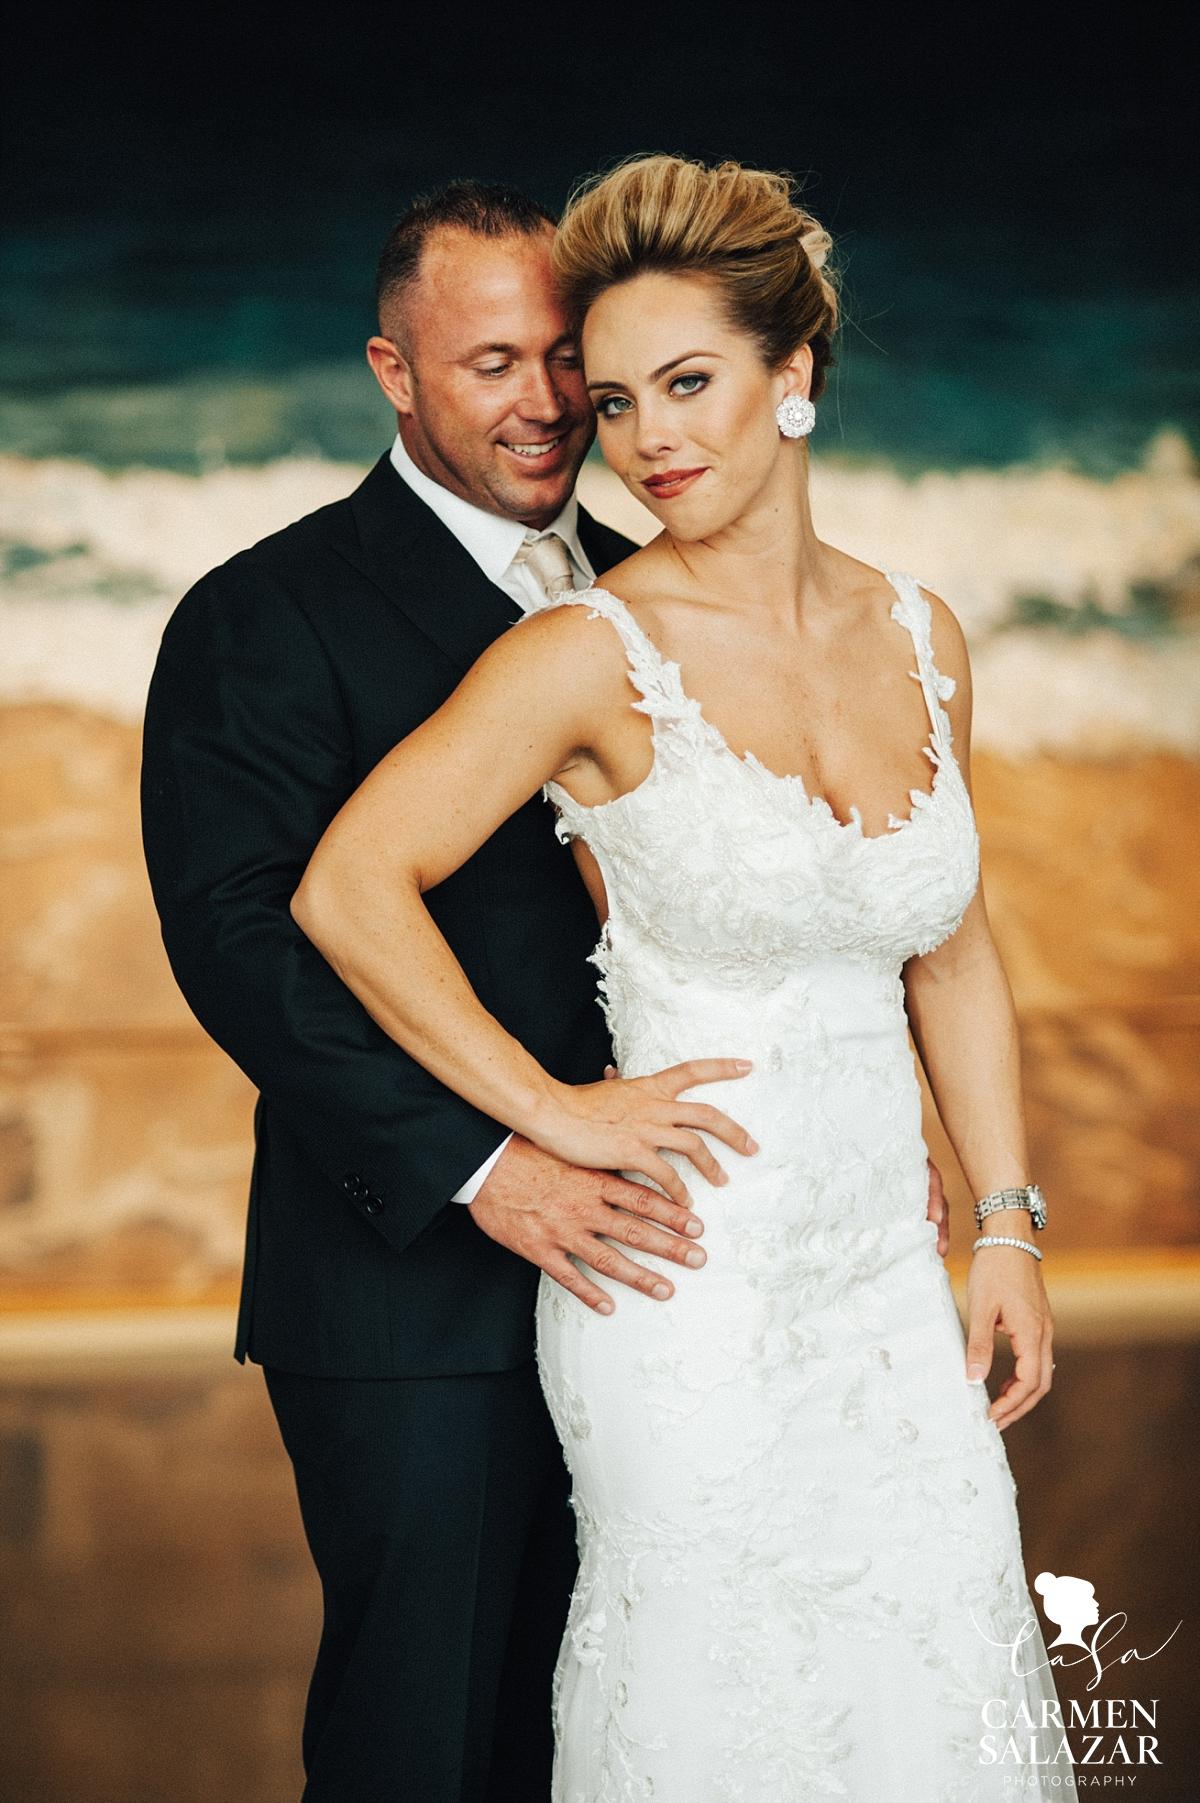 Crocker Art Museum elegant bride and classic groom - Carmen Salazar